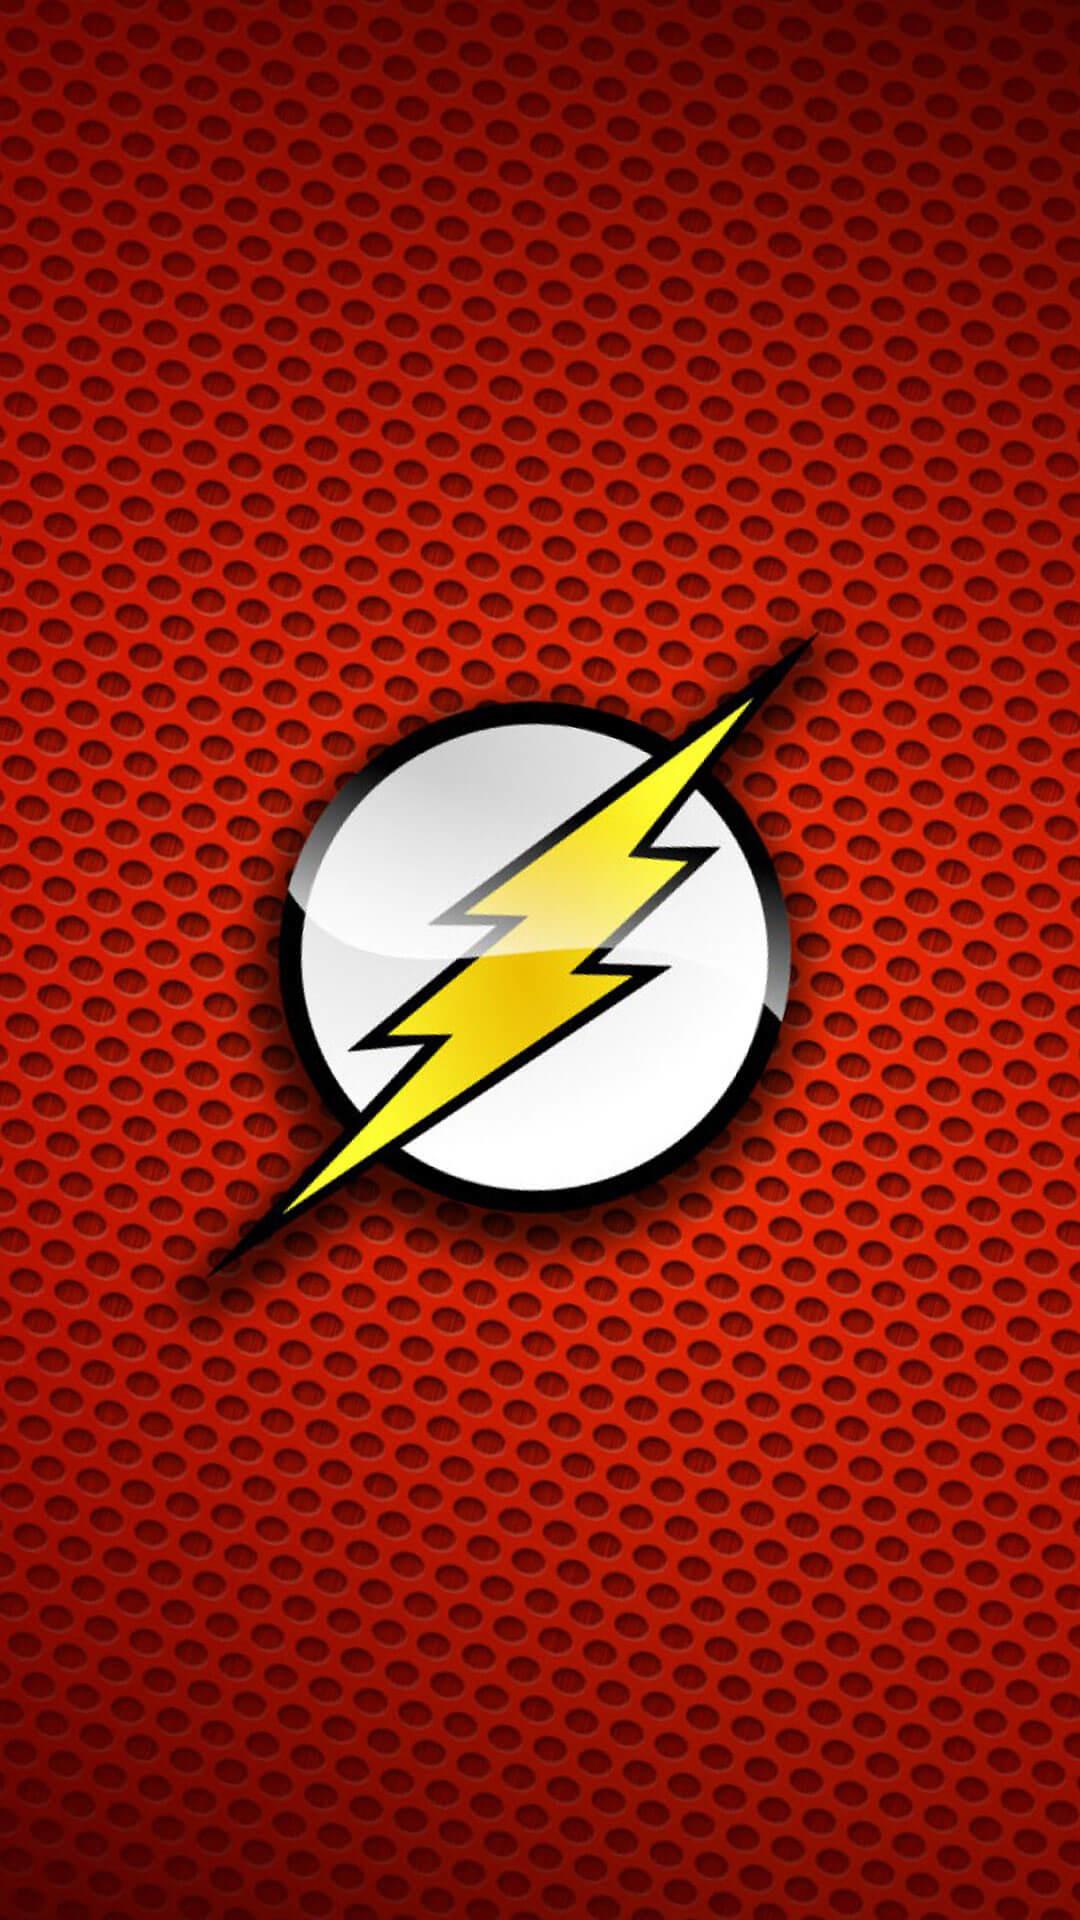 flash wallpaper iphone 6 the flash logo iphone 6 wallpaper